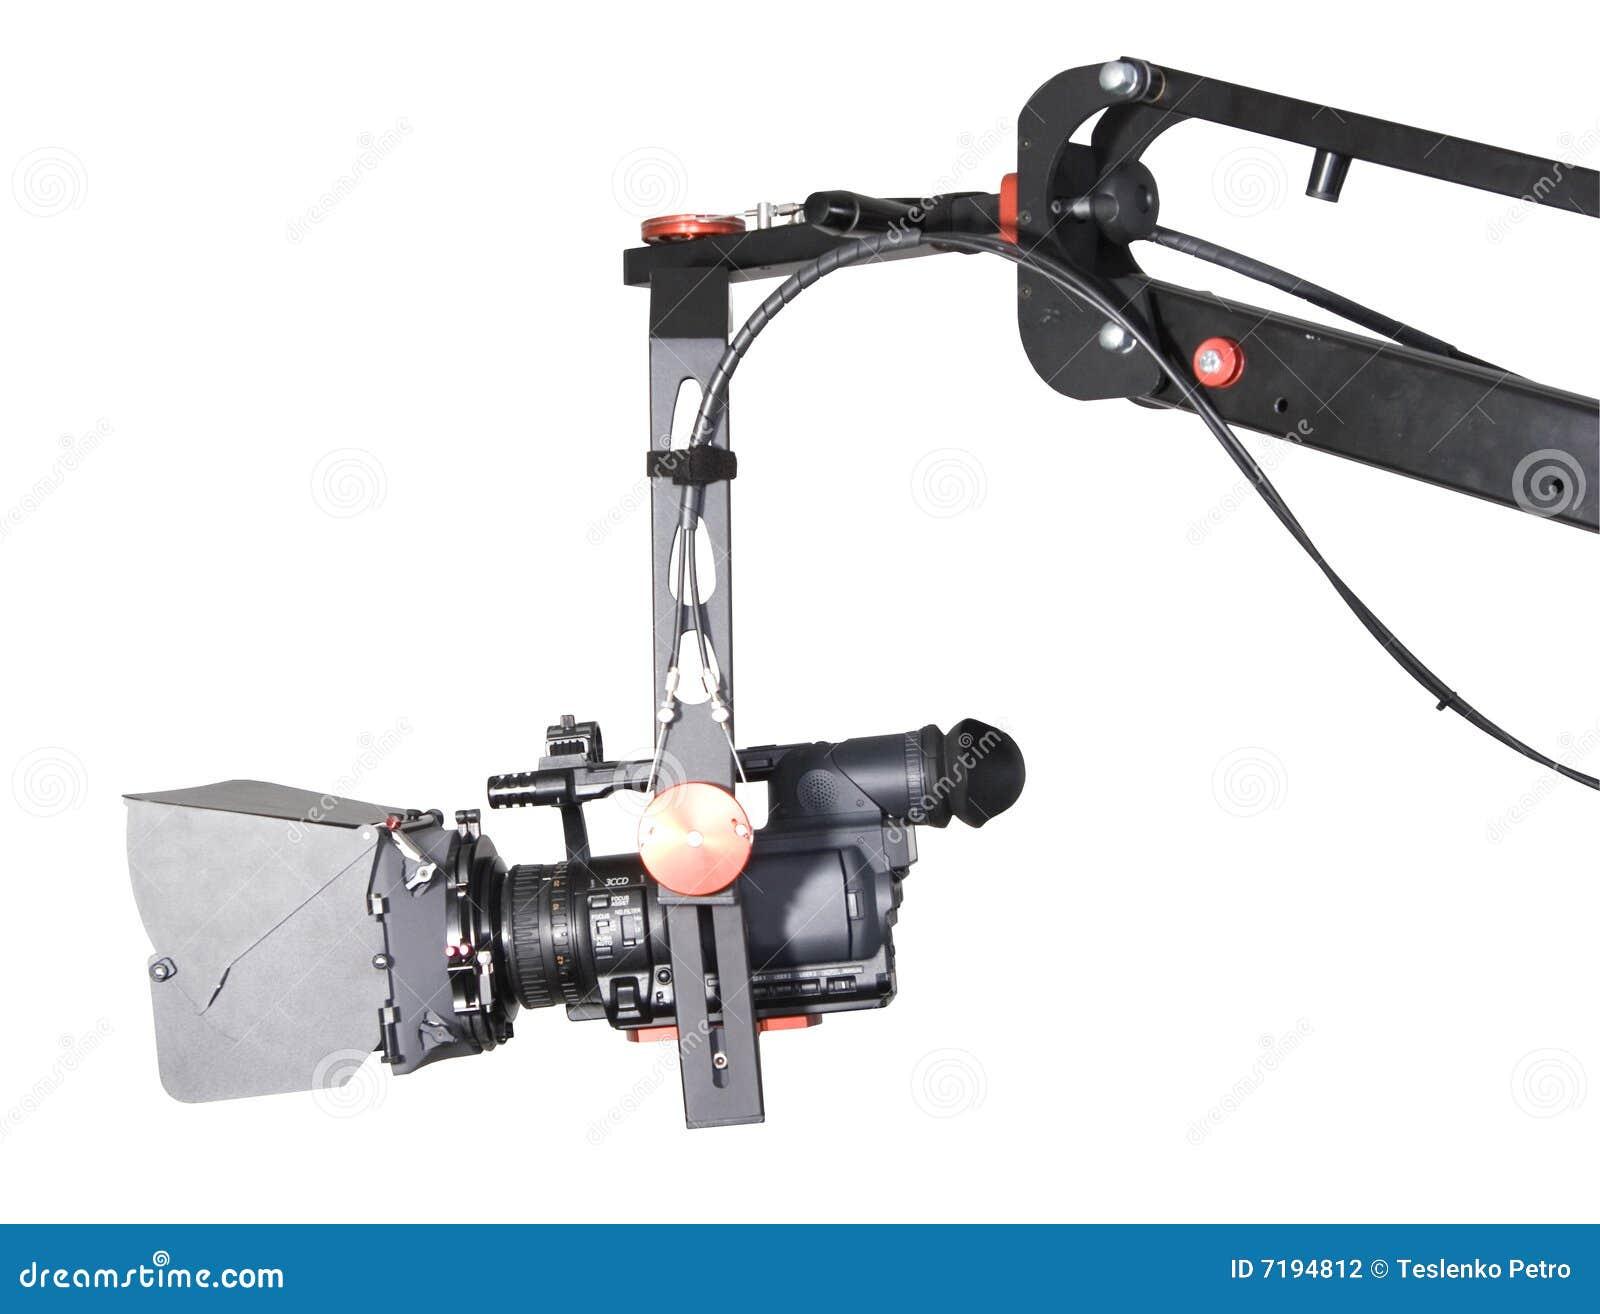 Camcorder γερανός hd